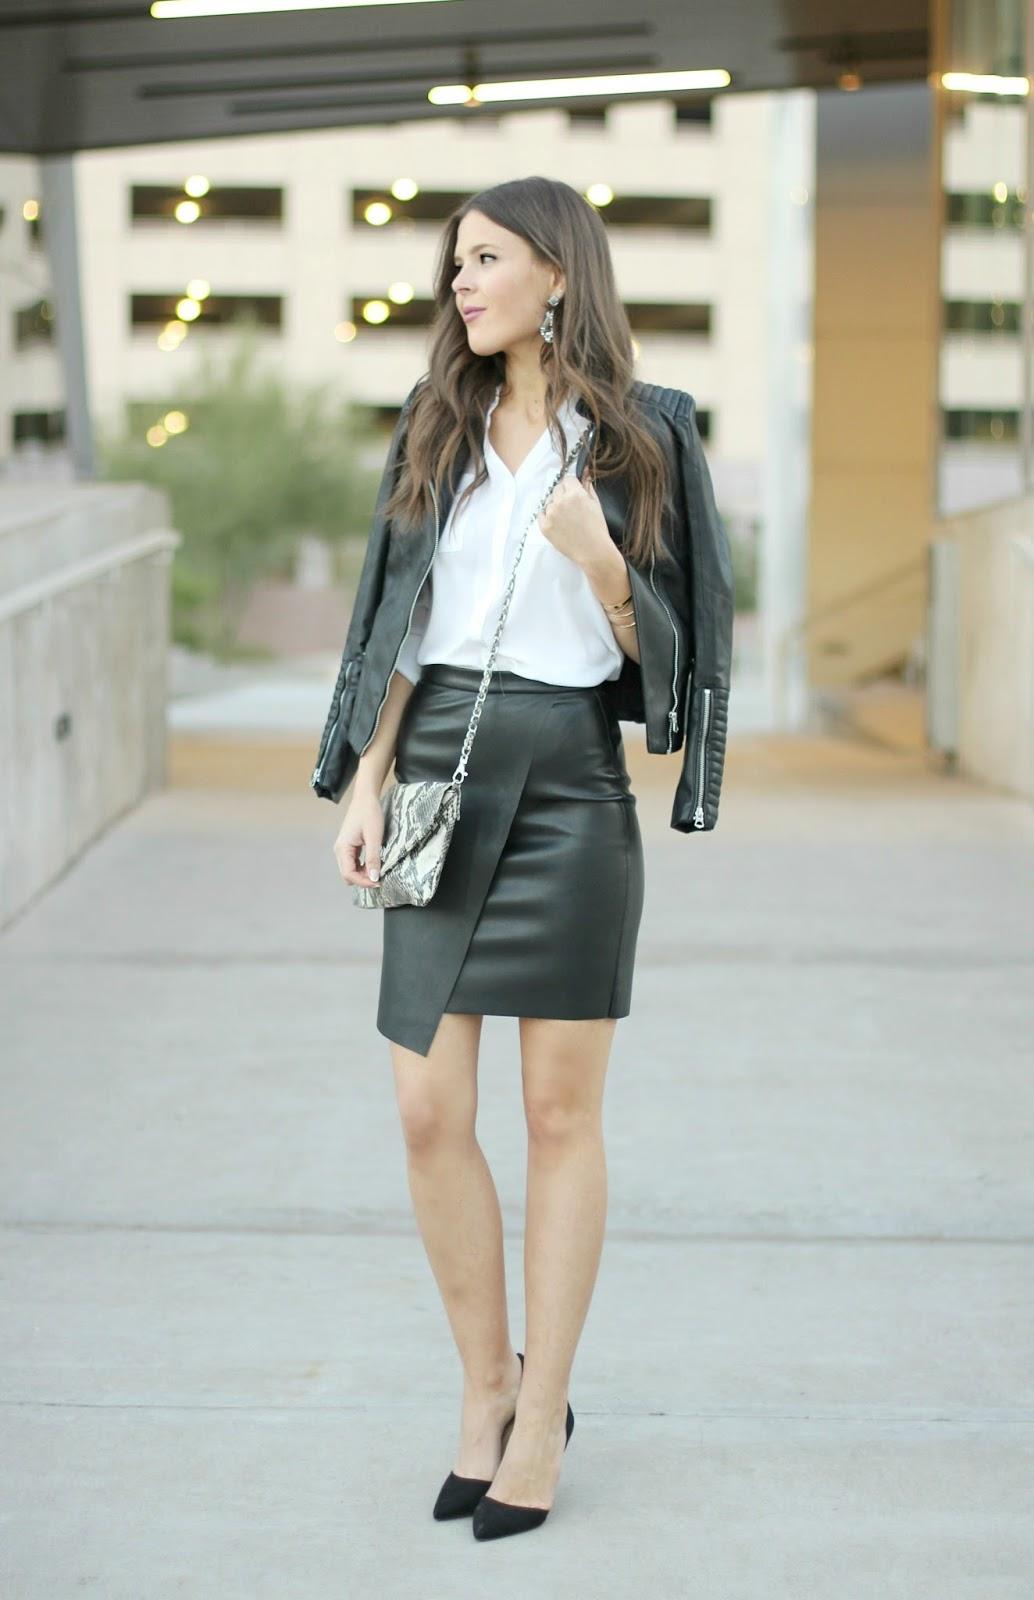 Sophistifunk by Brie Bemis Rearick | A Fashion + Lifestyle Blog ...